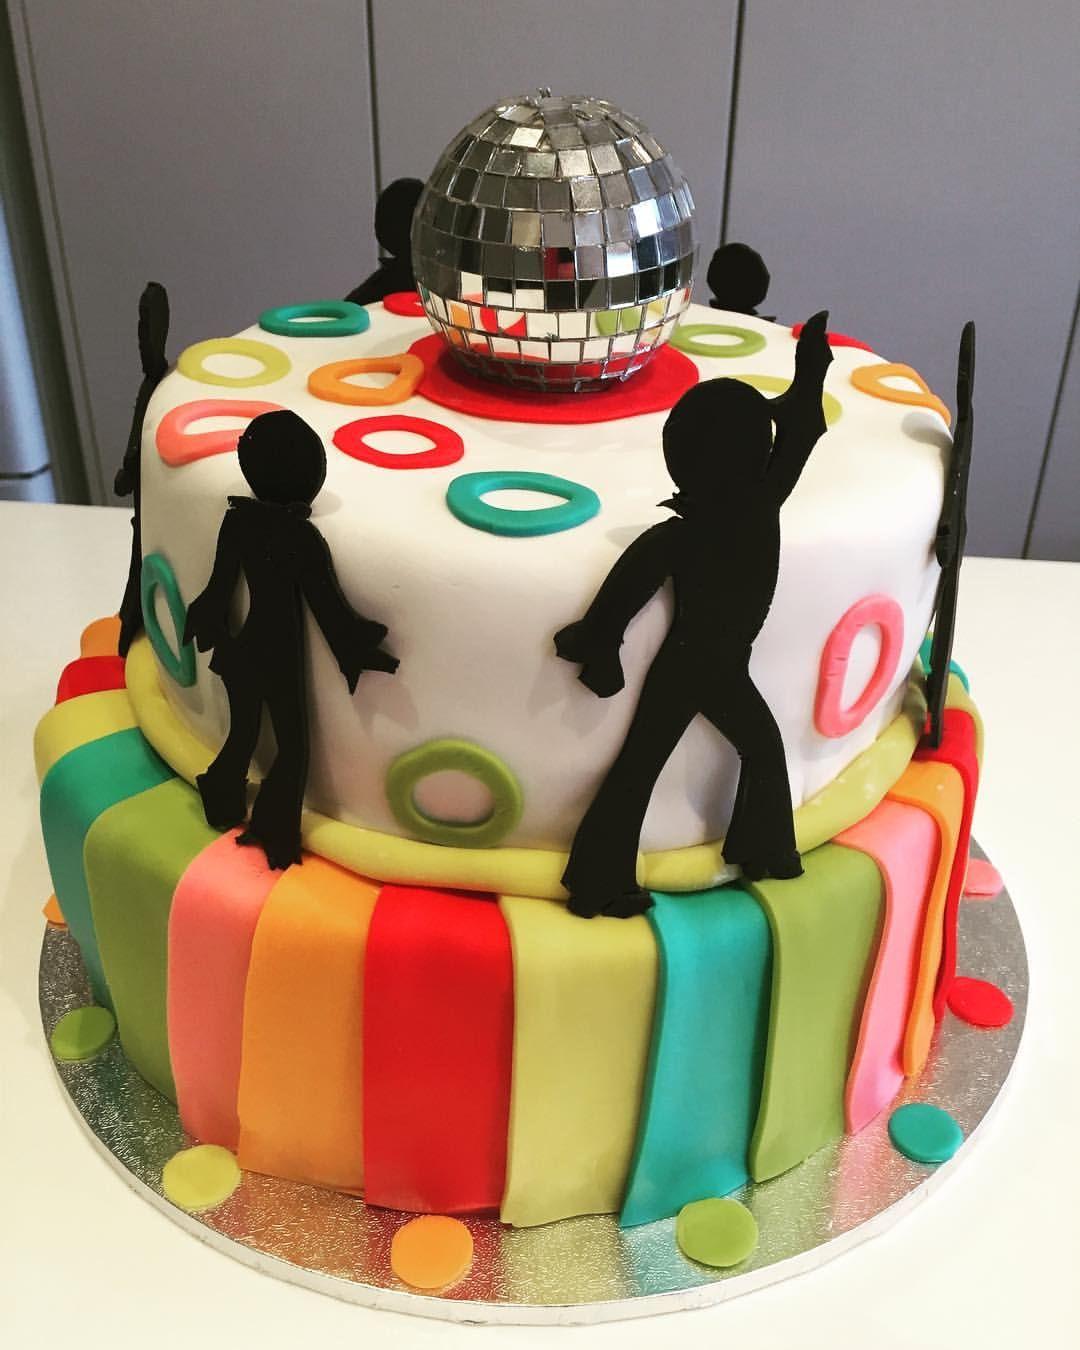 Disco birthday cake today! Belgian chocolate fudge piñata